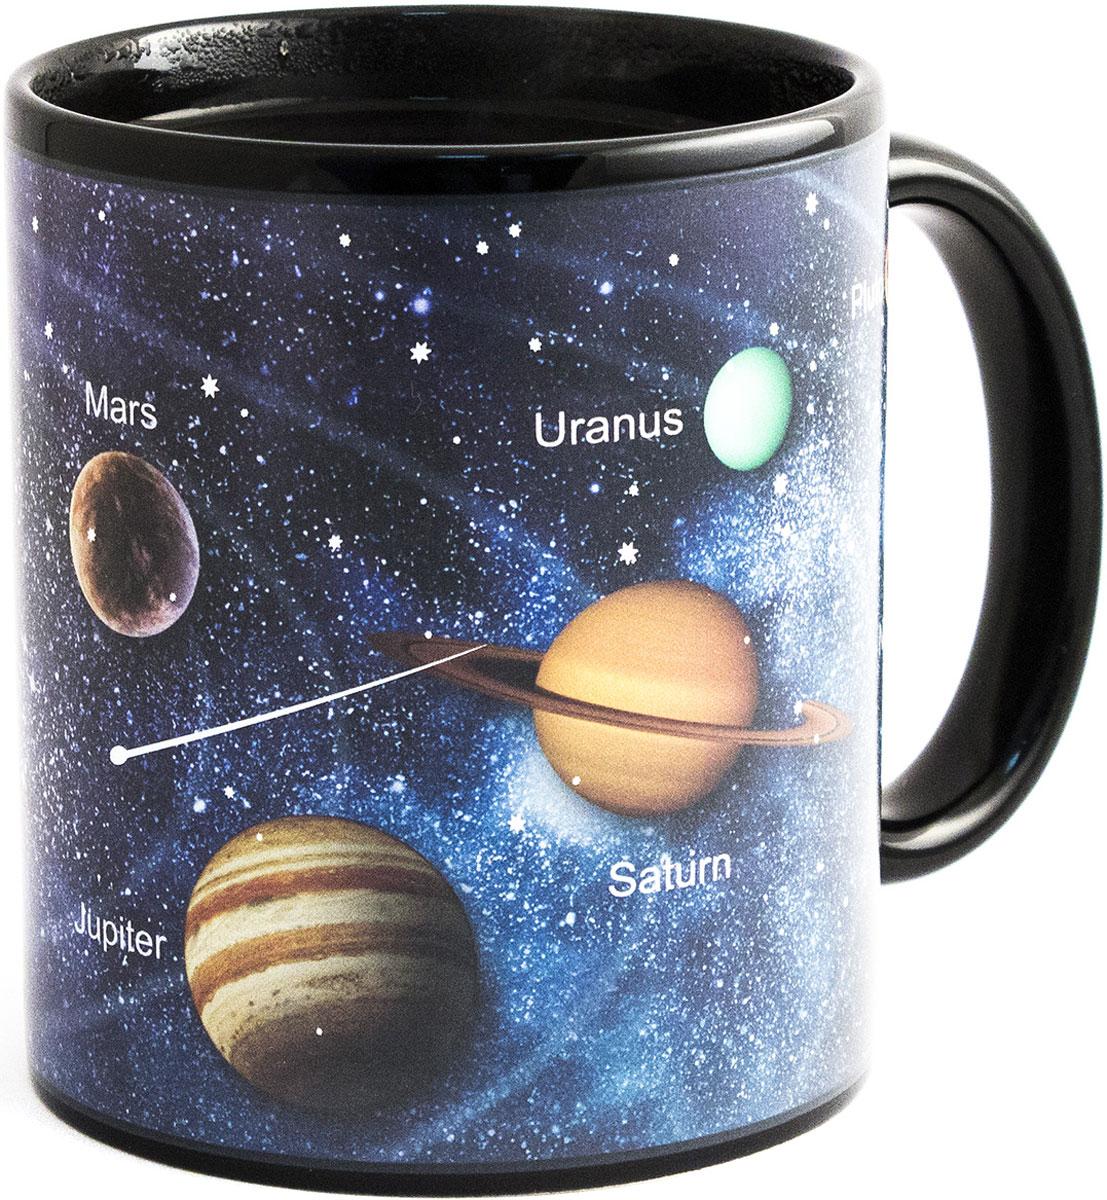 Кружка хамелеон Эврика Звездное небо, 300 мл. 98482 картленд барбара звездное небо гонконга